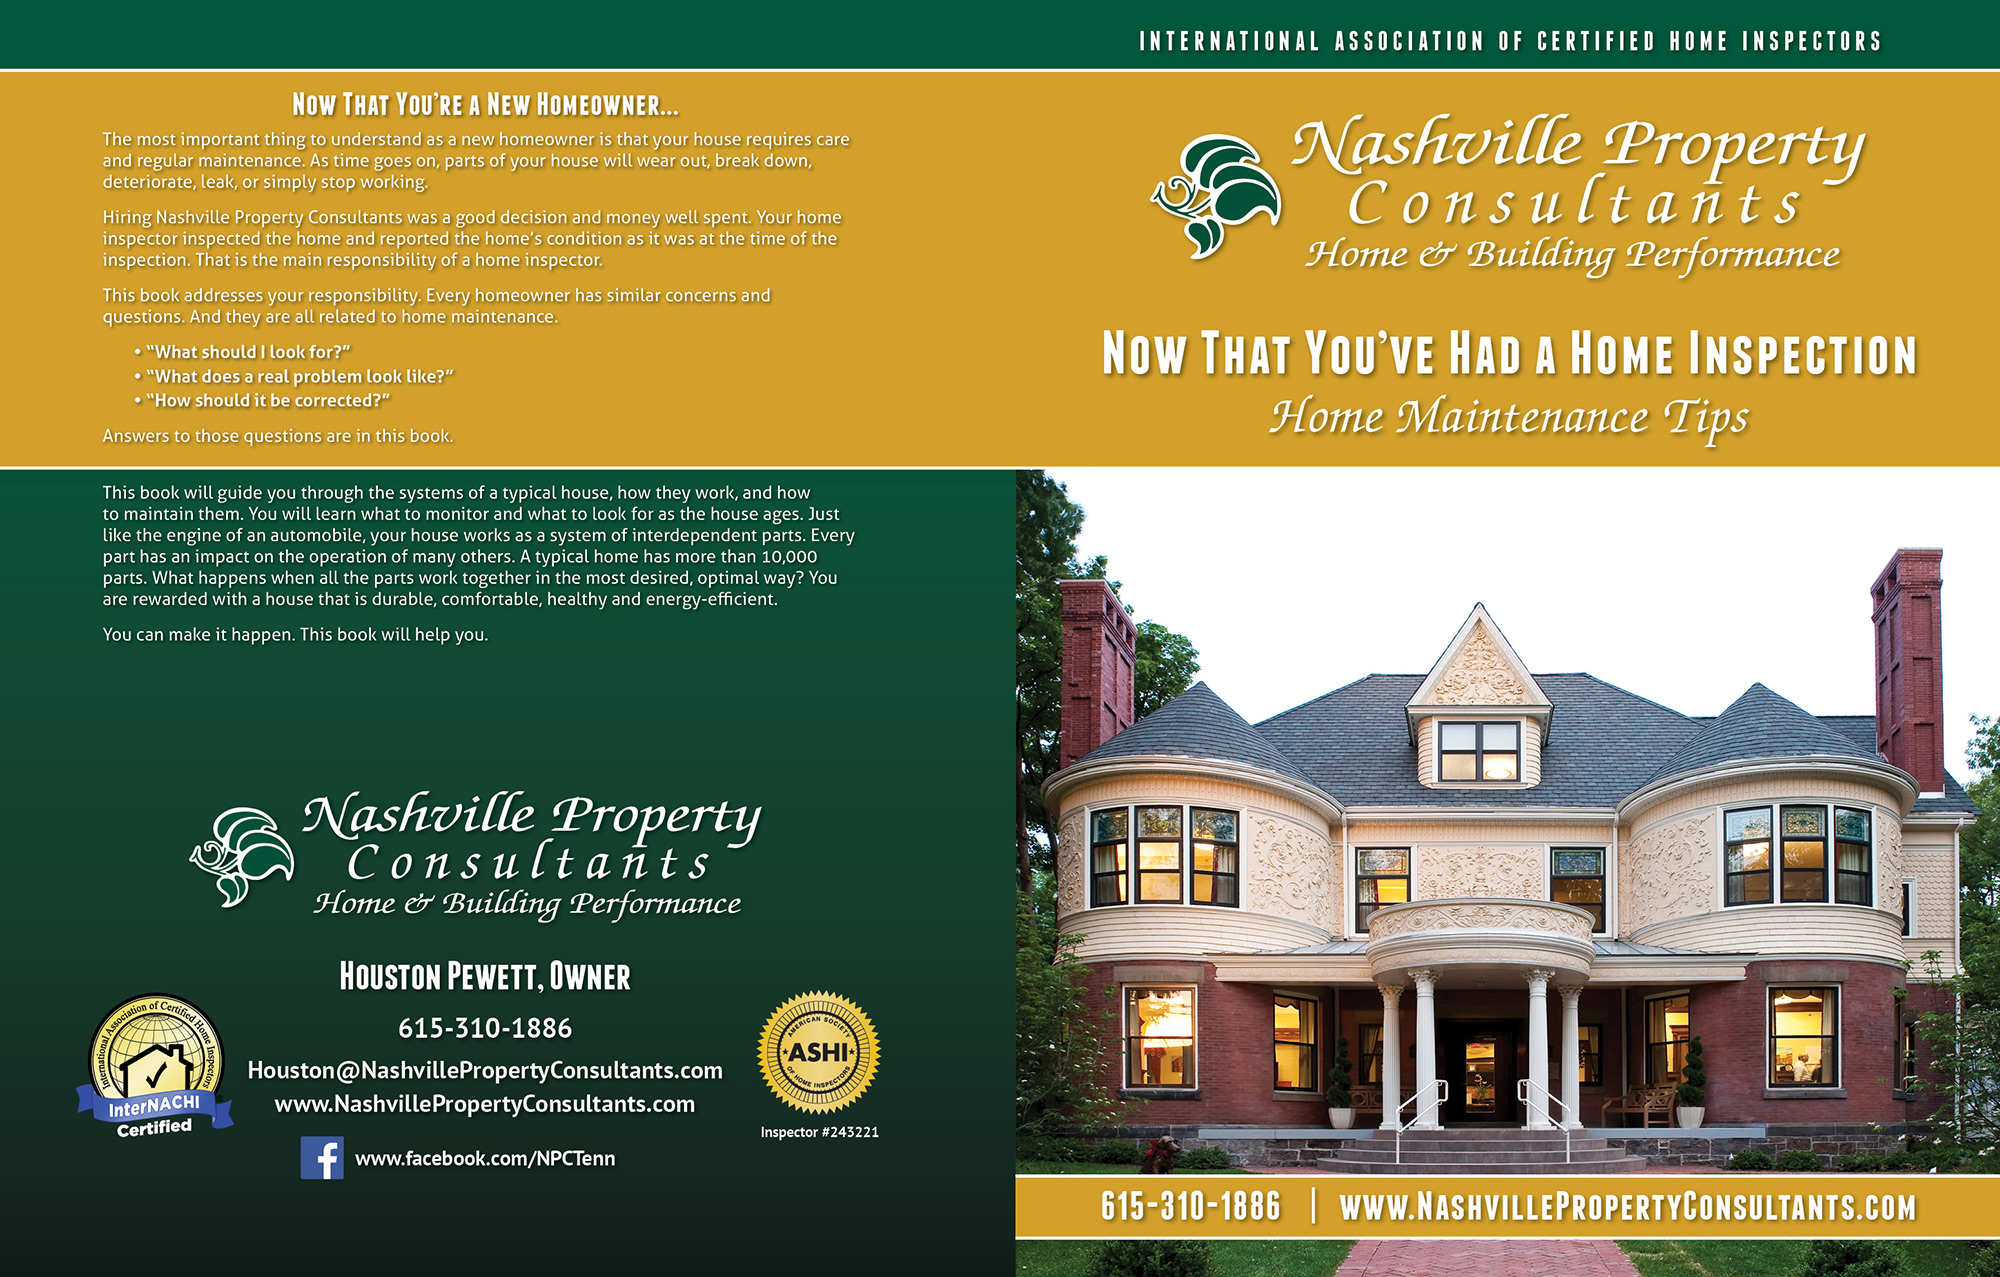 Custom Home Maintenance Book for Nashville Property Consultants.